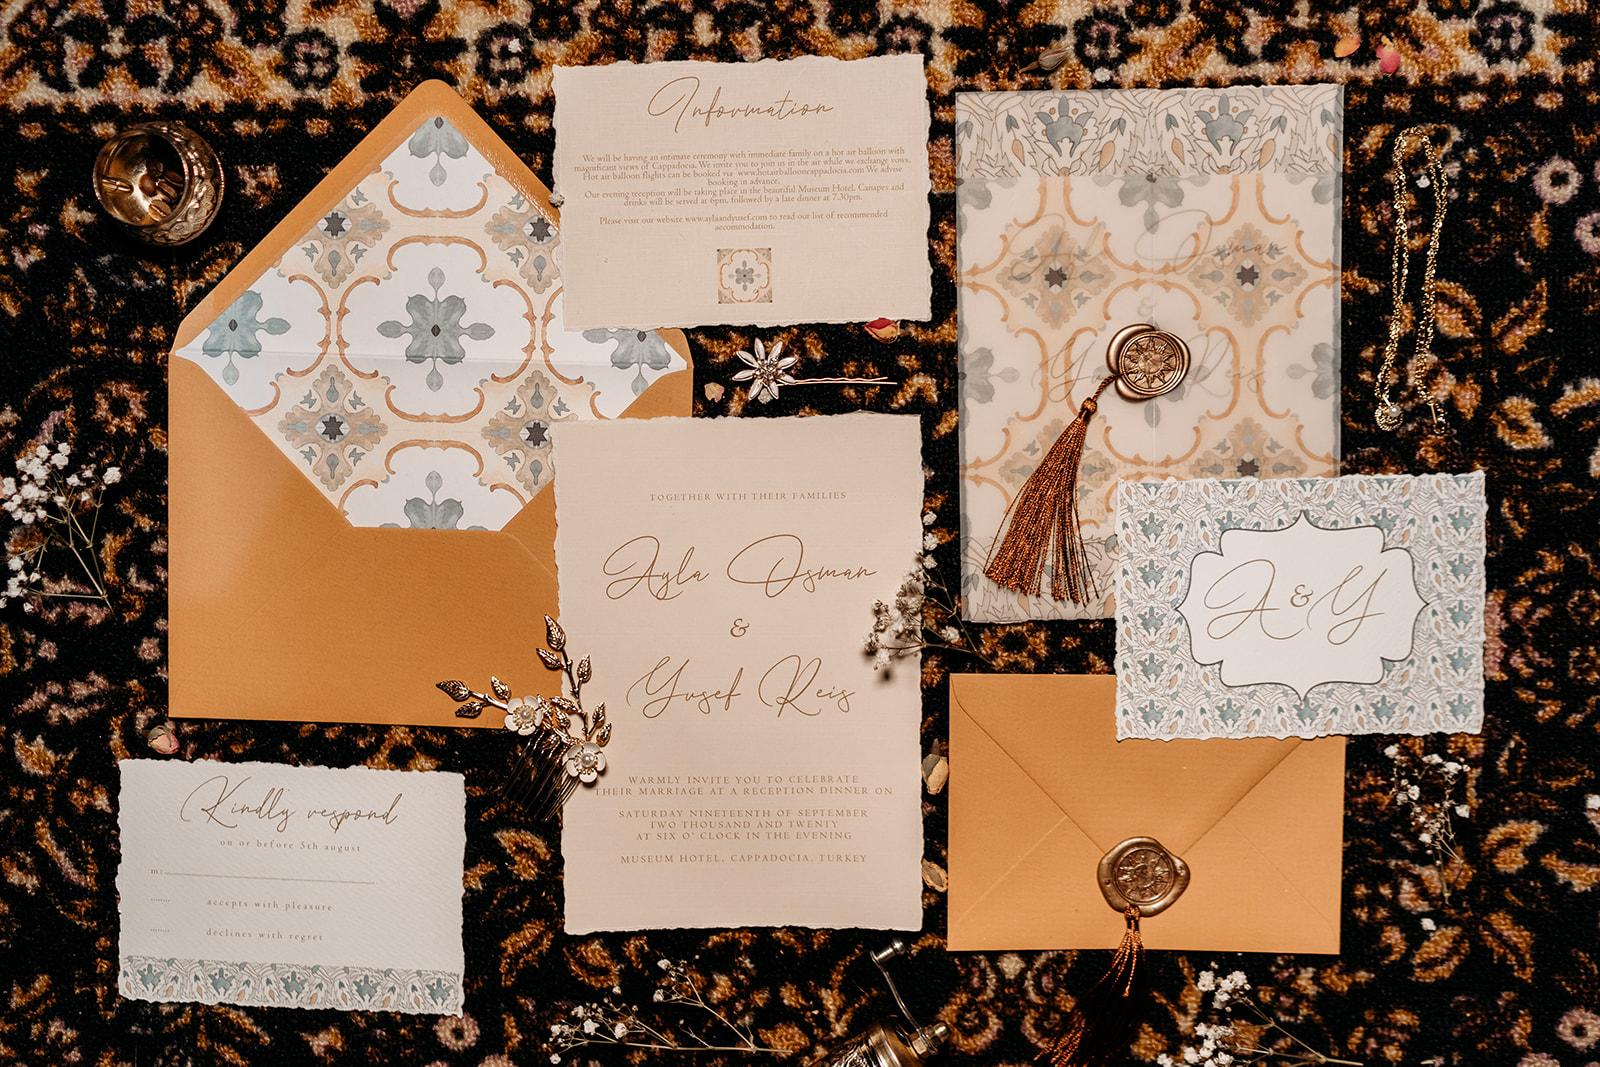 Turkish inspired wedding stationery - unique wedding stationery - orange and teal wedding stationery